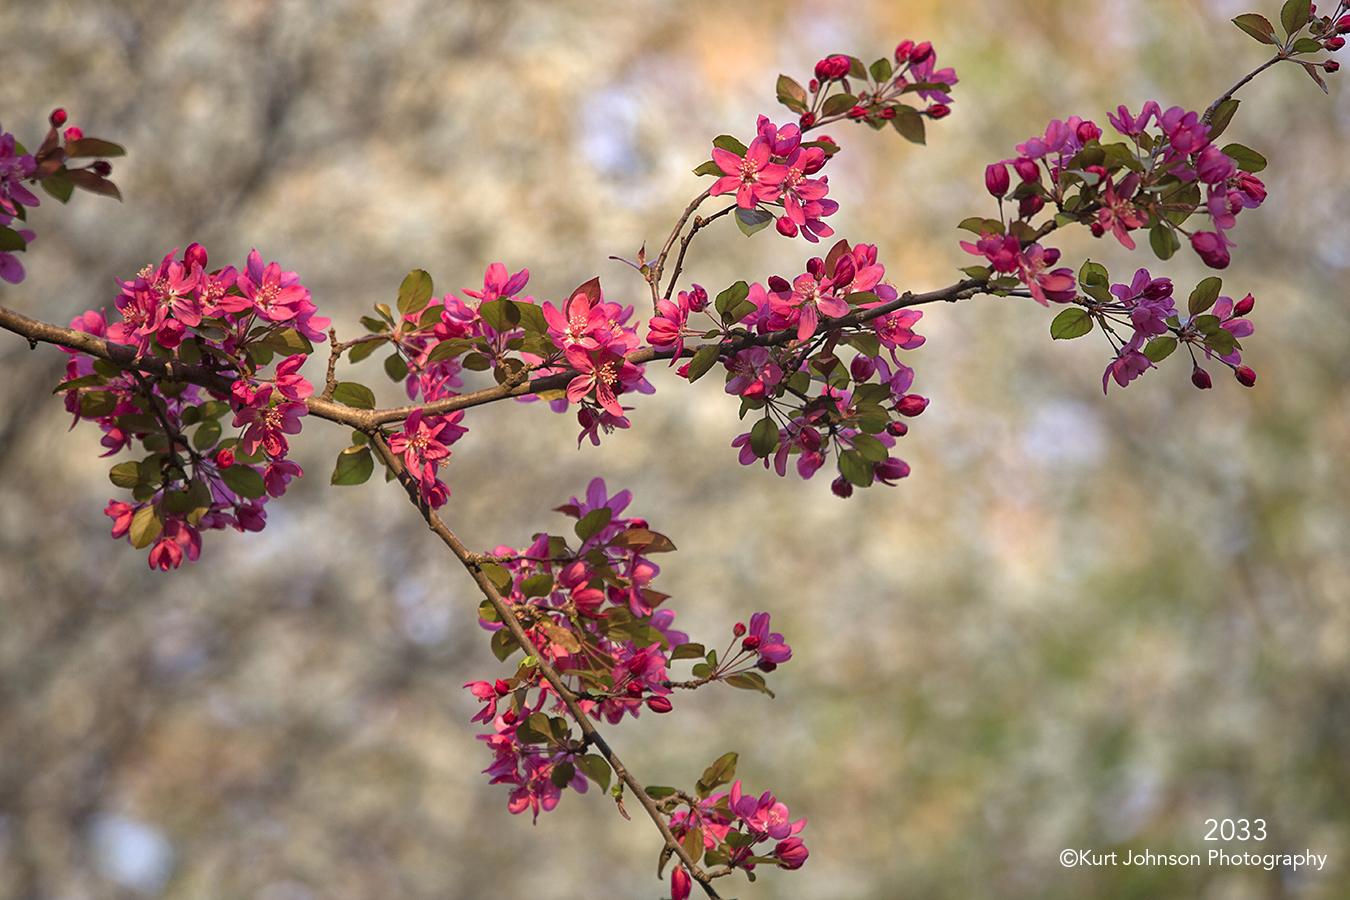 flower buds branch flowering tree pink white flowers